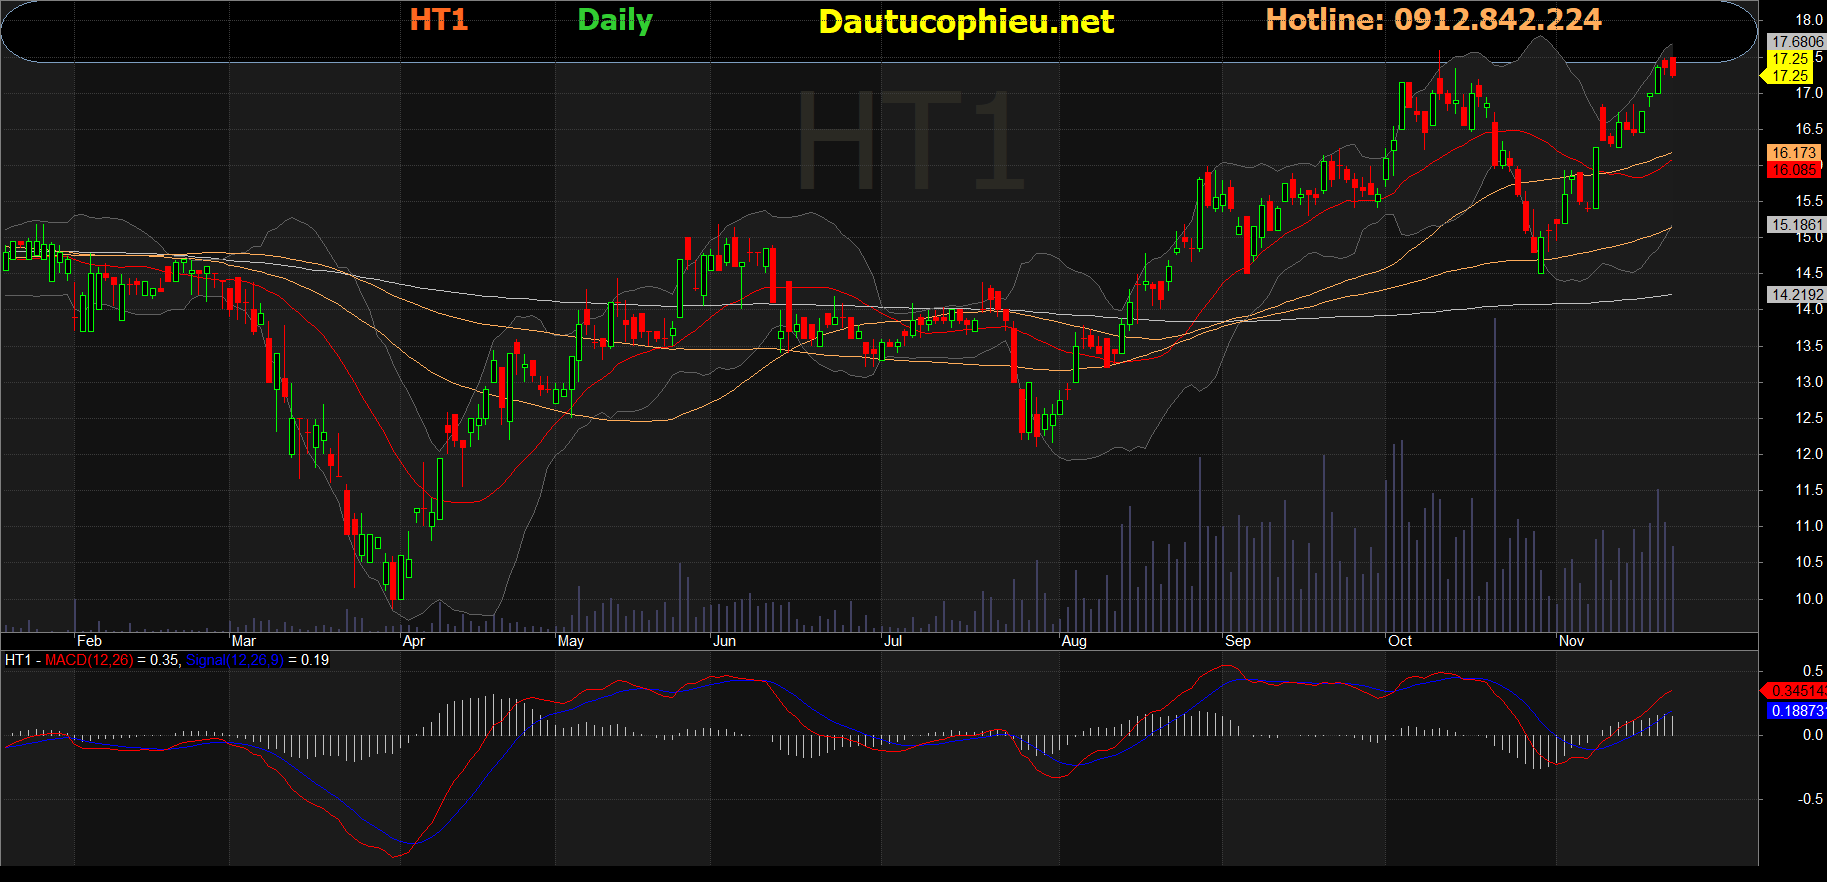 Cổ phiếu HT1